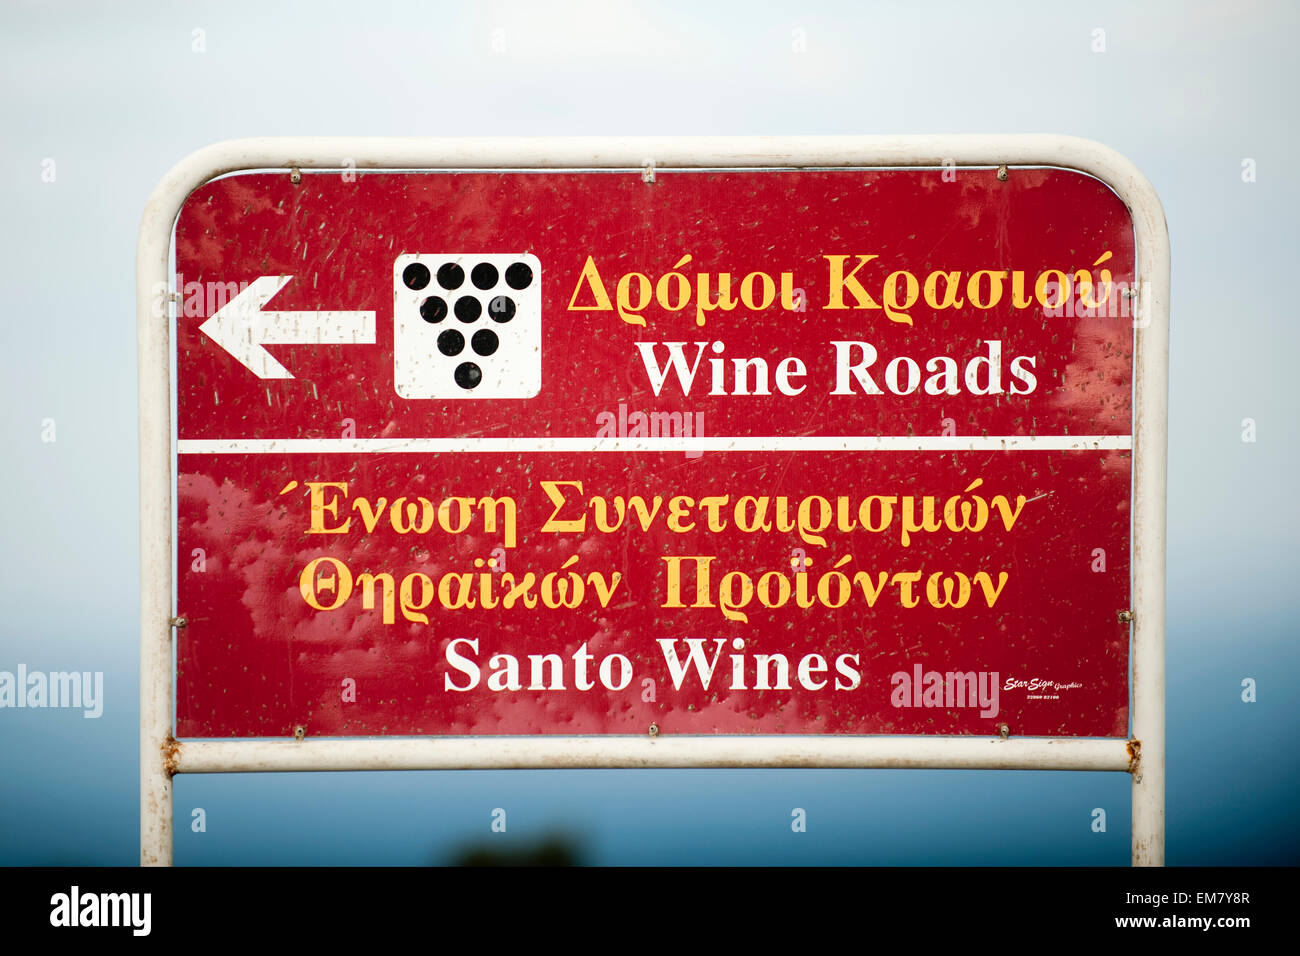 Griechenland, Kykladen, Santorini, Exo Gonia, Schild Strade del Vino Immagini Stock